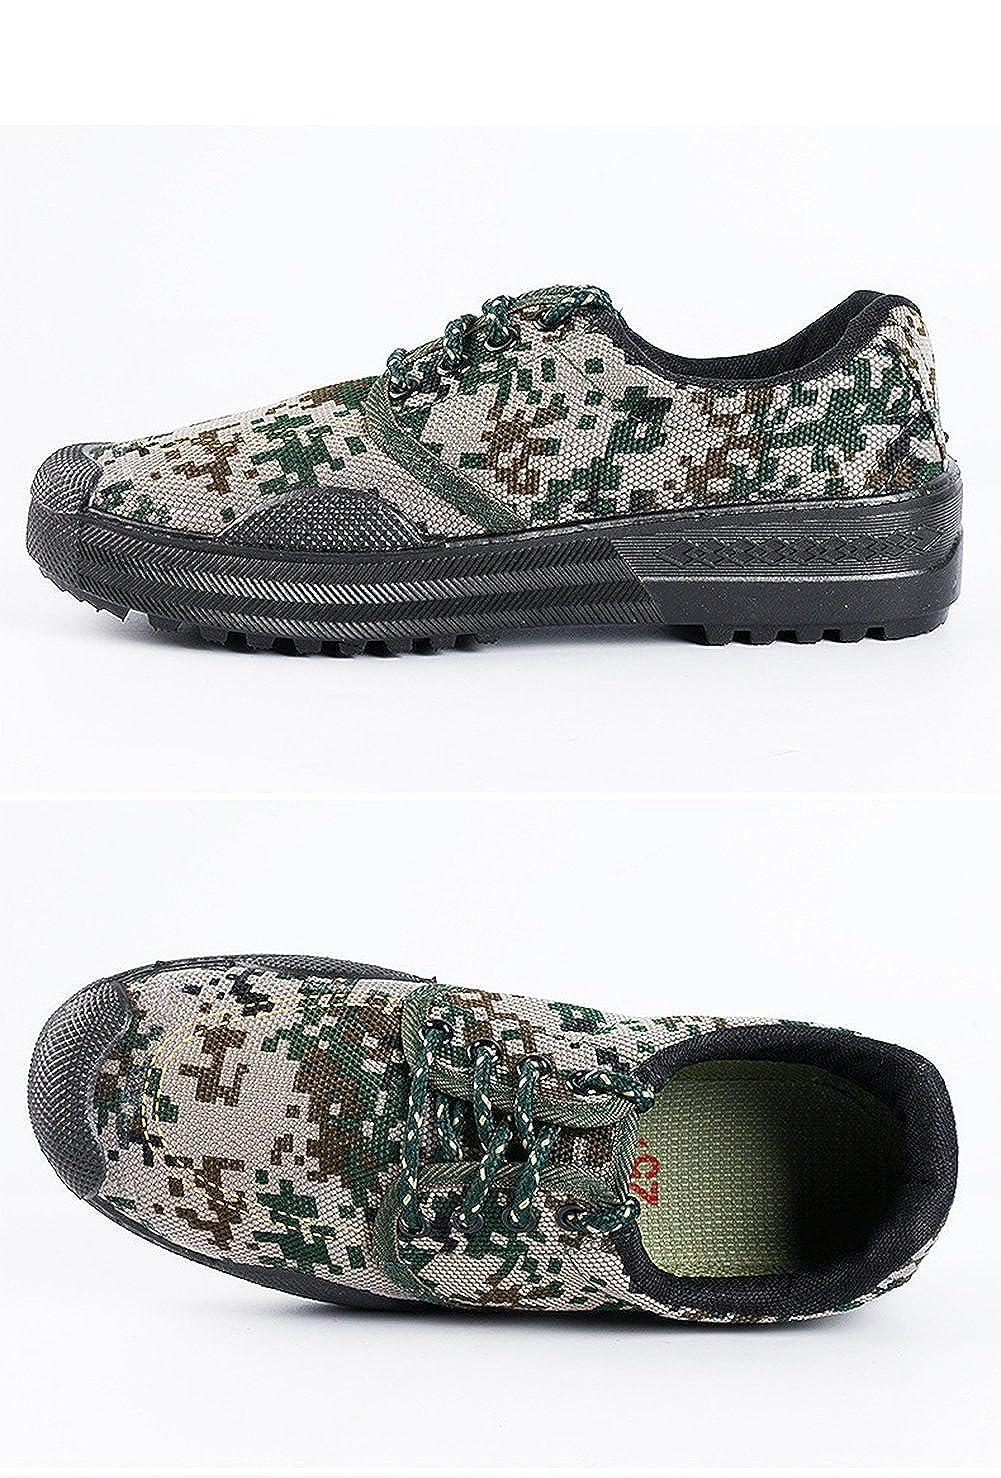 fd36046d7178c Amazon.com: Unisex Men Women Working Safety Low-Cut Camouflage Green Shoes  Slip-Resistant Sneaker: Shoes